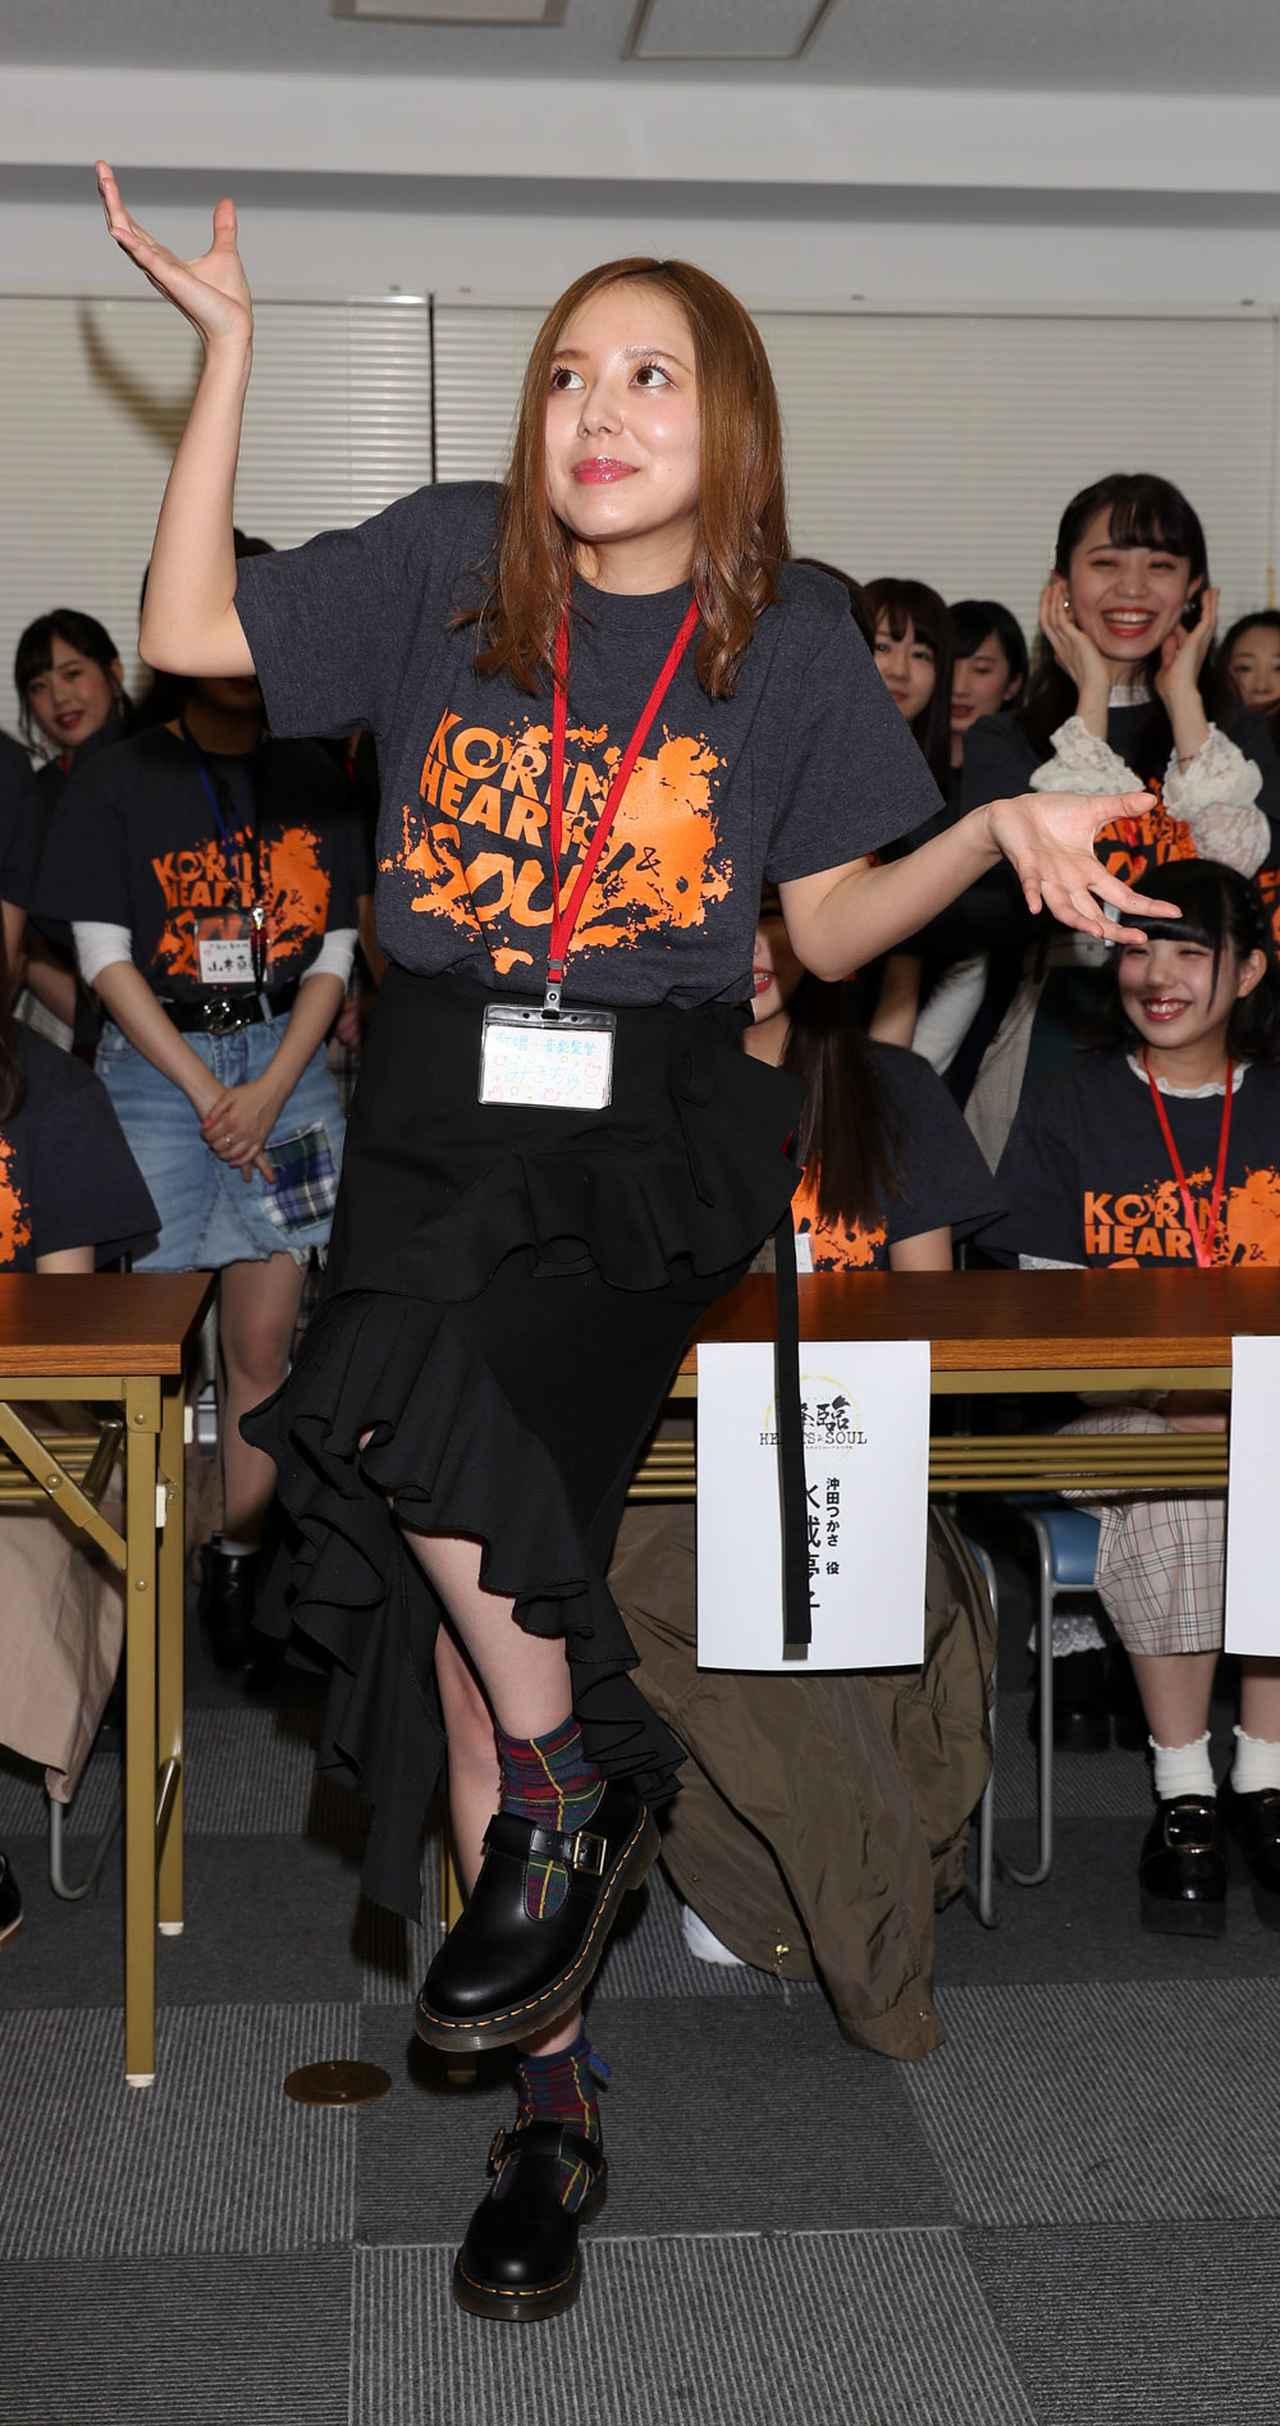 Images : 7番目の画像 - 「若林倫香、水城夢子/アリスインプロジェクト最新舞台「降臨HEARTS&SOUL」、新たな演出を施して4/25よりアクションたっぷりに上演!」のアルバム - Stereo Sound ONLINE